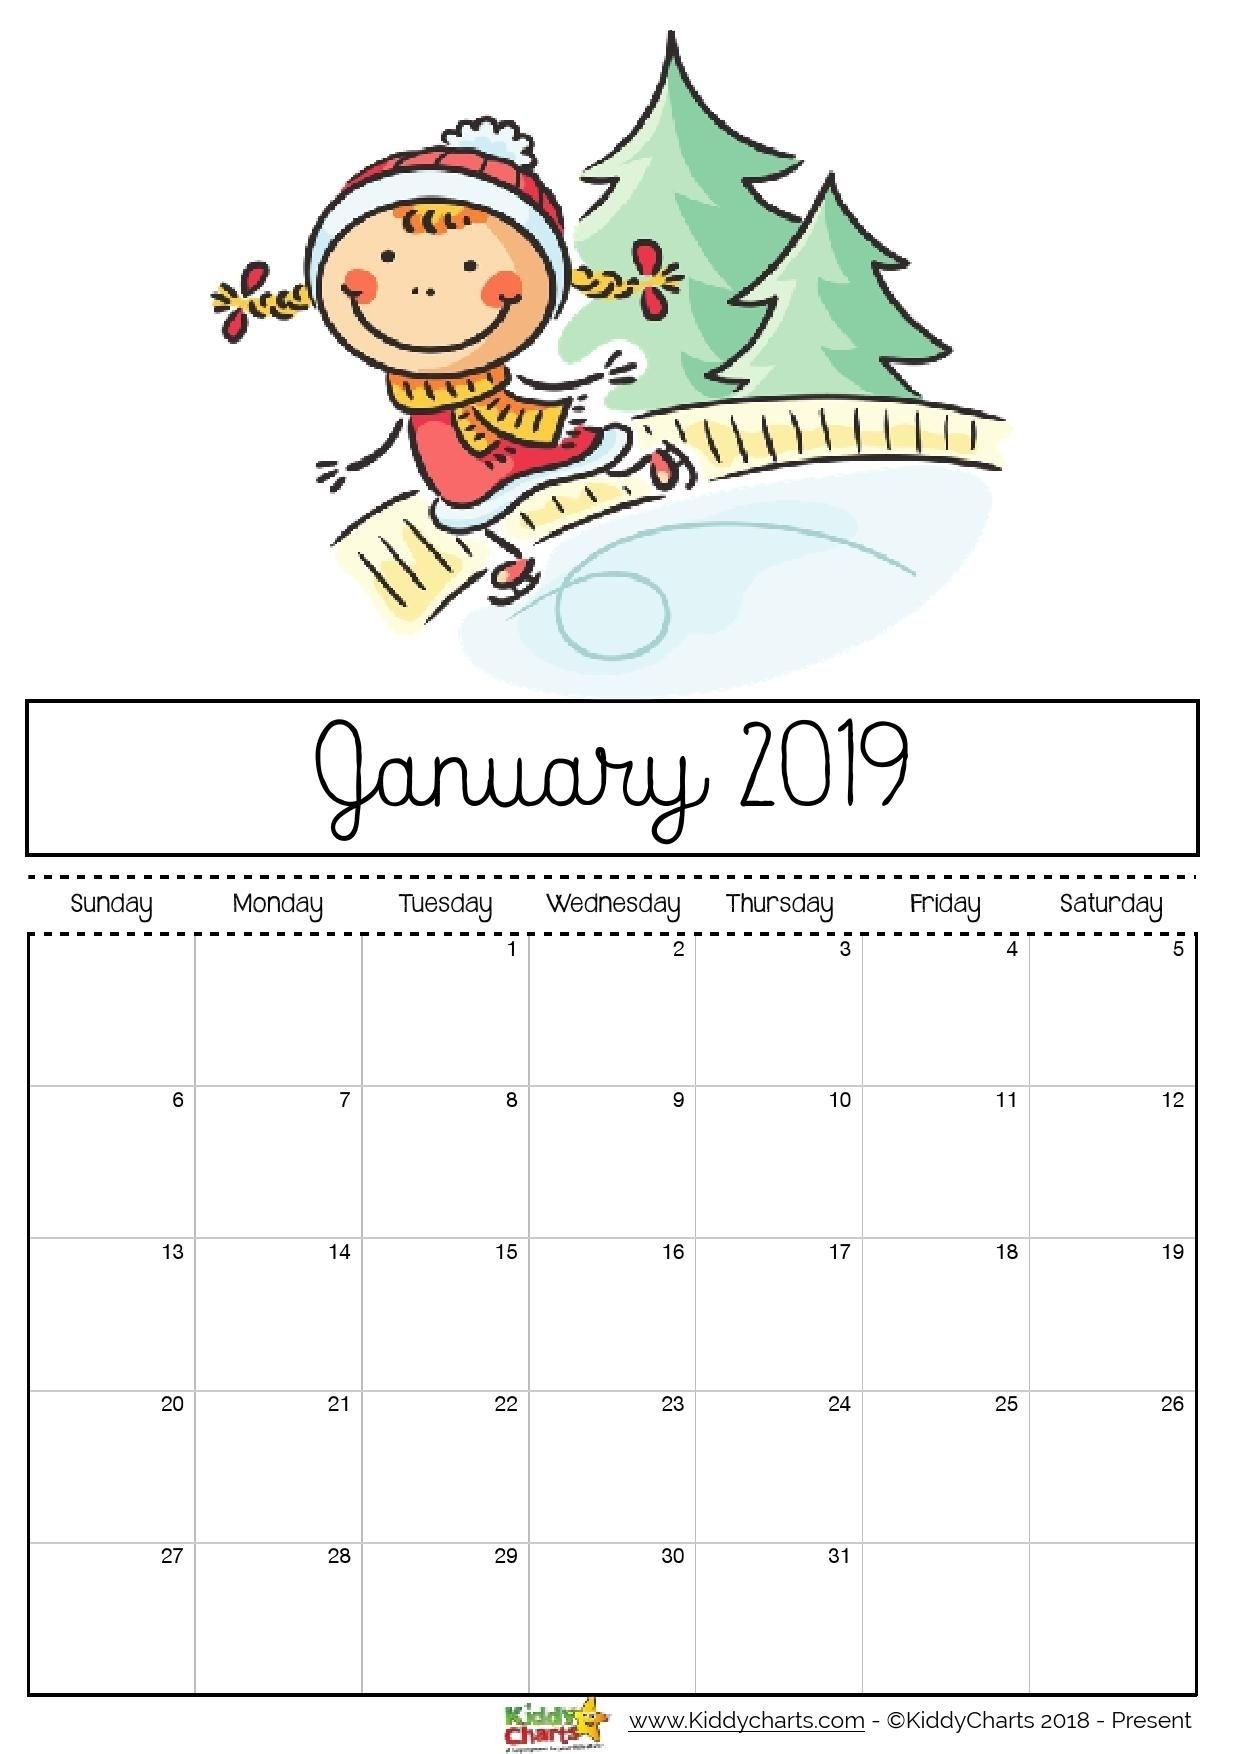 Free Printable Calendar Girly | Calendar Printables, Kids